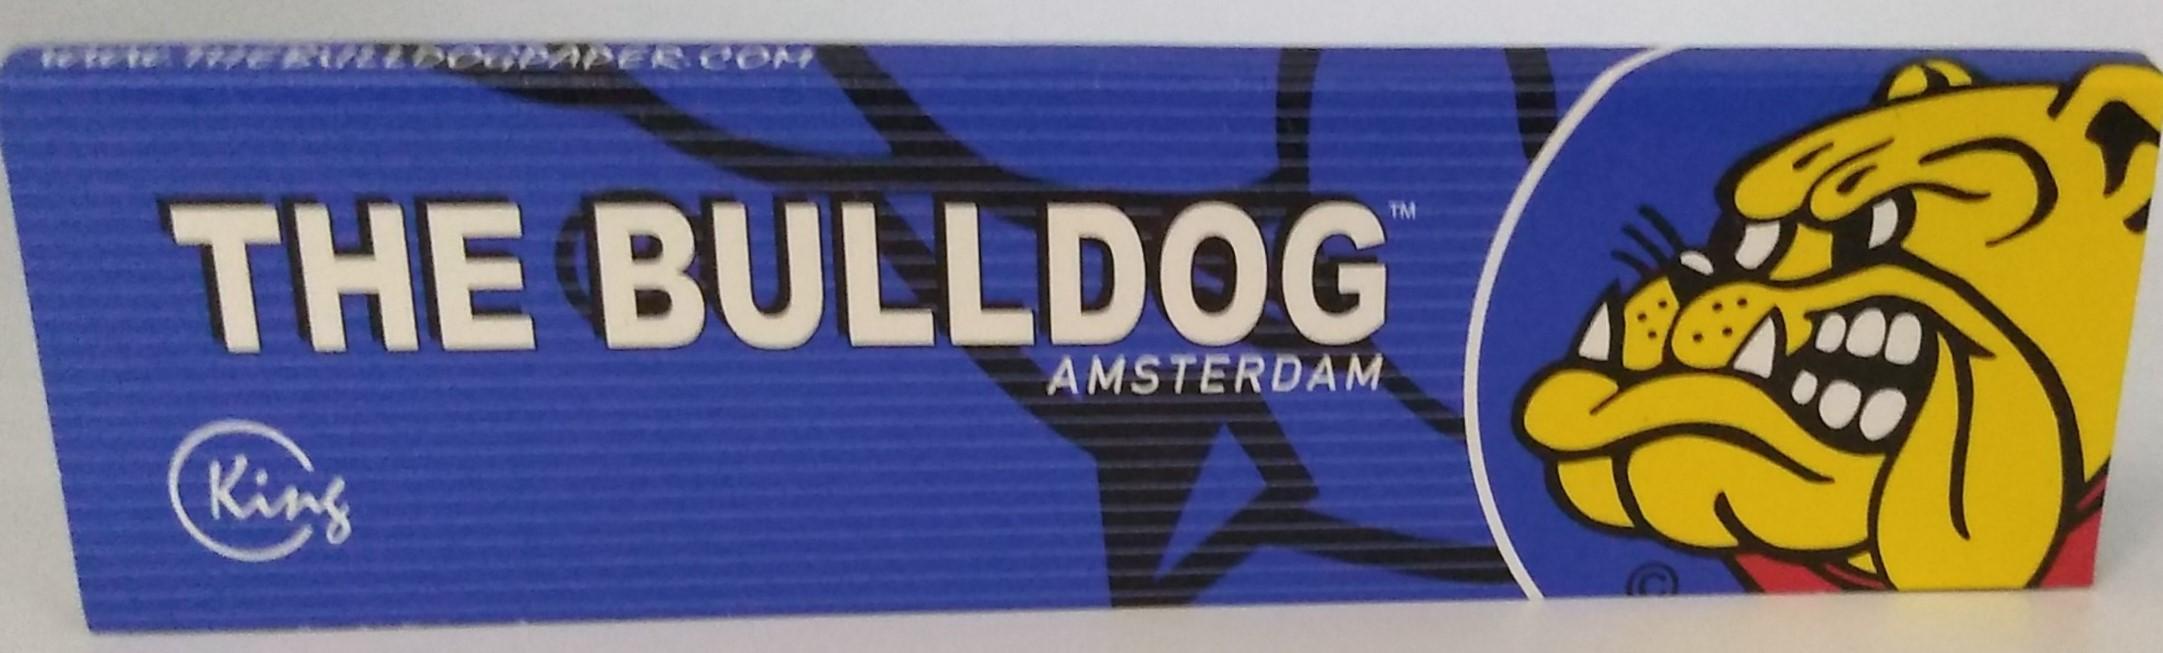 Papel The Bulldog Blue King Size